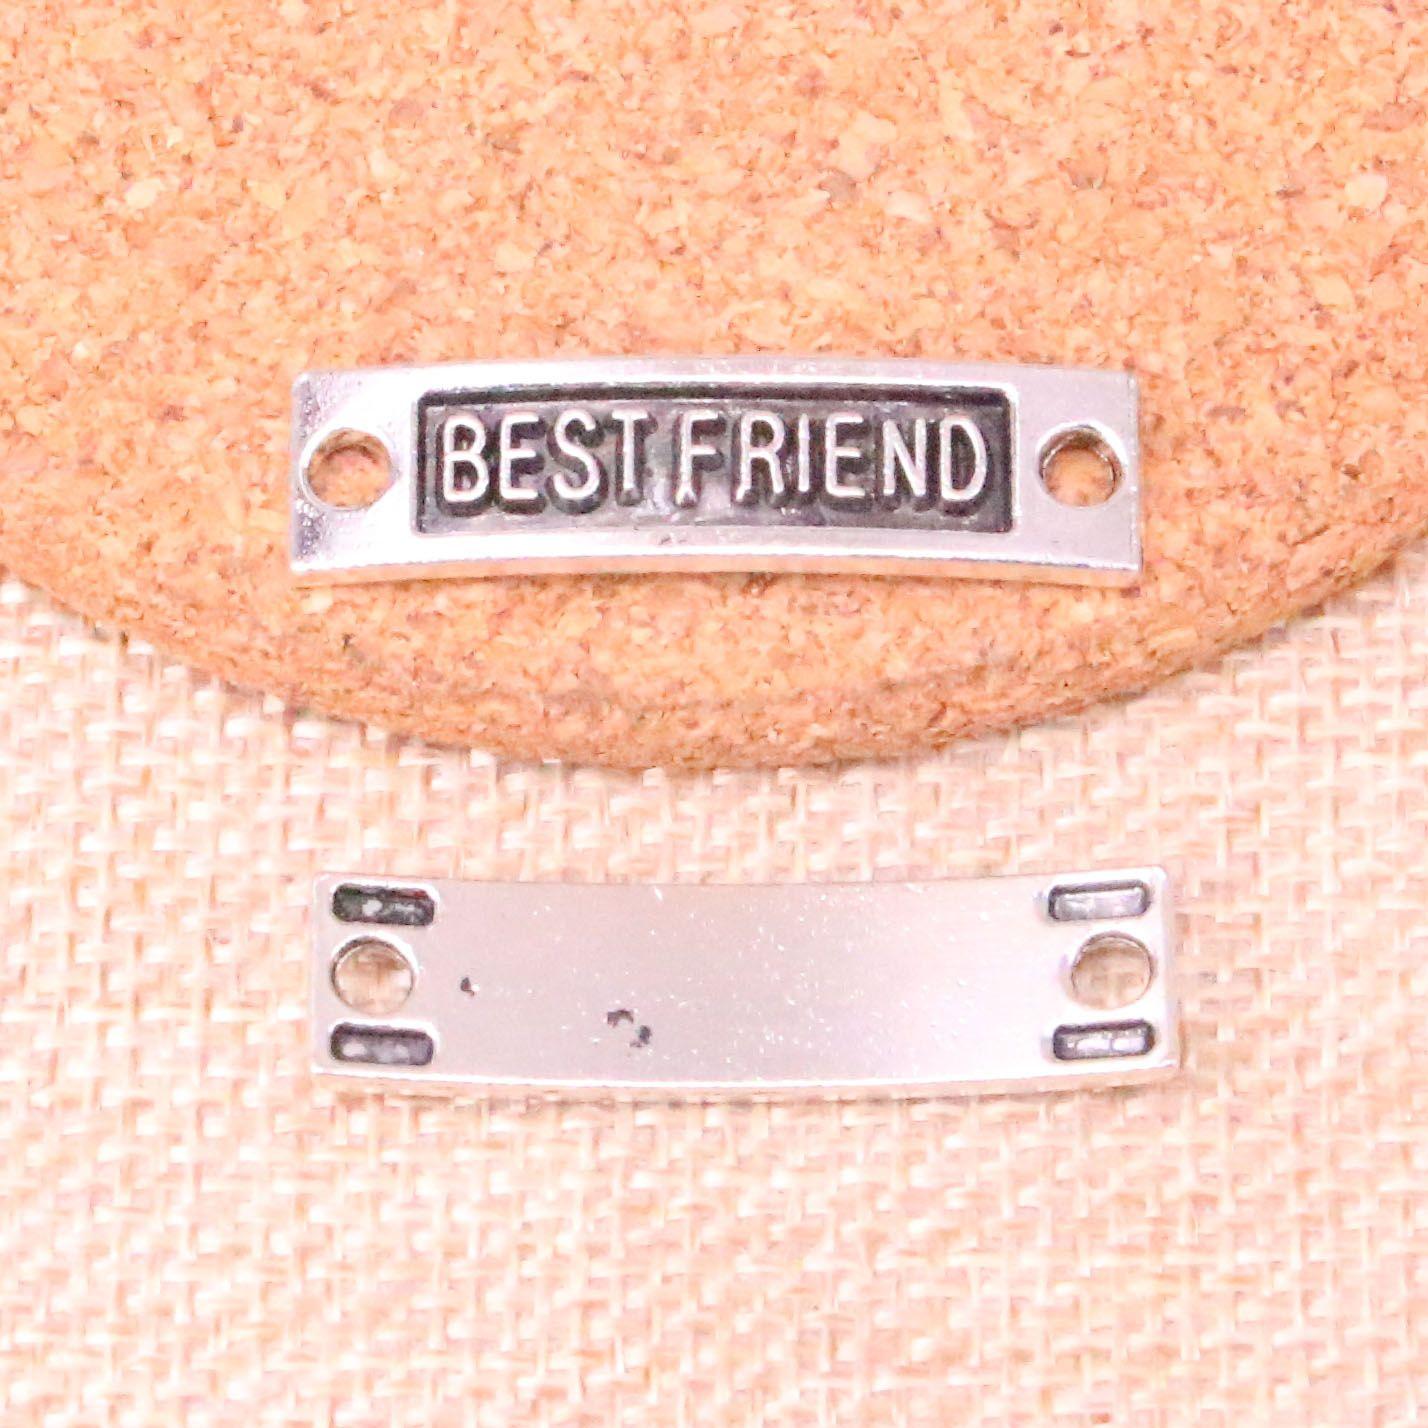 40pcs Antique silver best friend connector Charms Pendant Fit Bracelets Necklace DIY Metal Jewelry Making 35*9mm